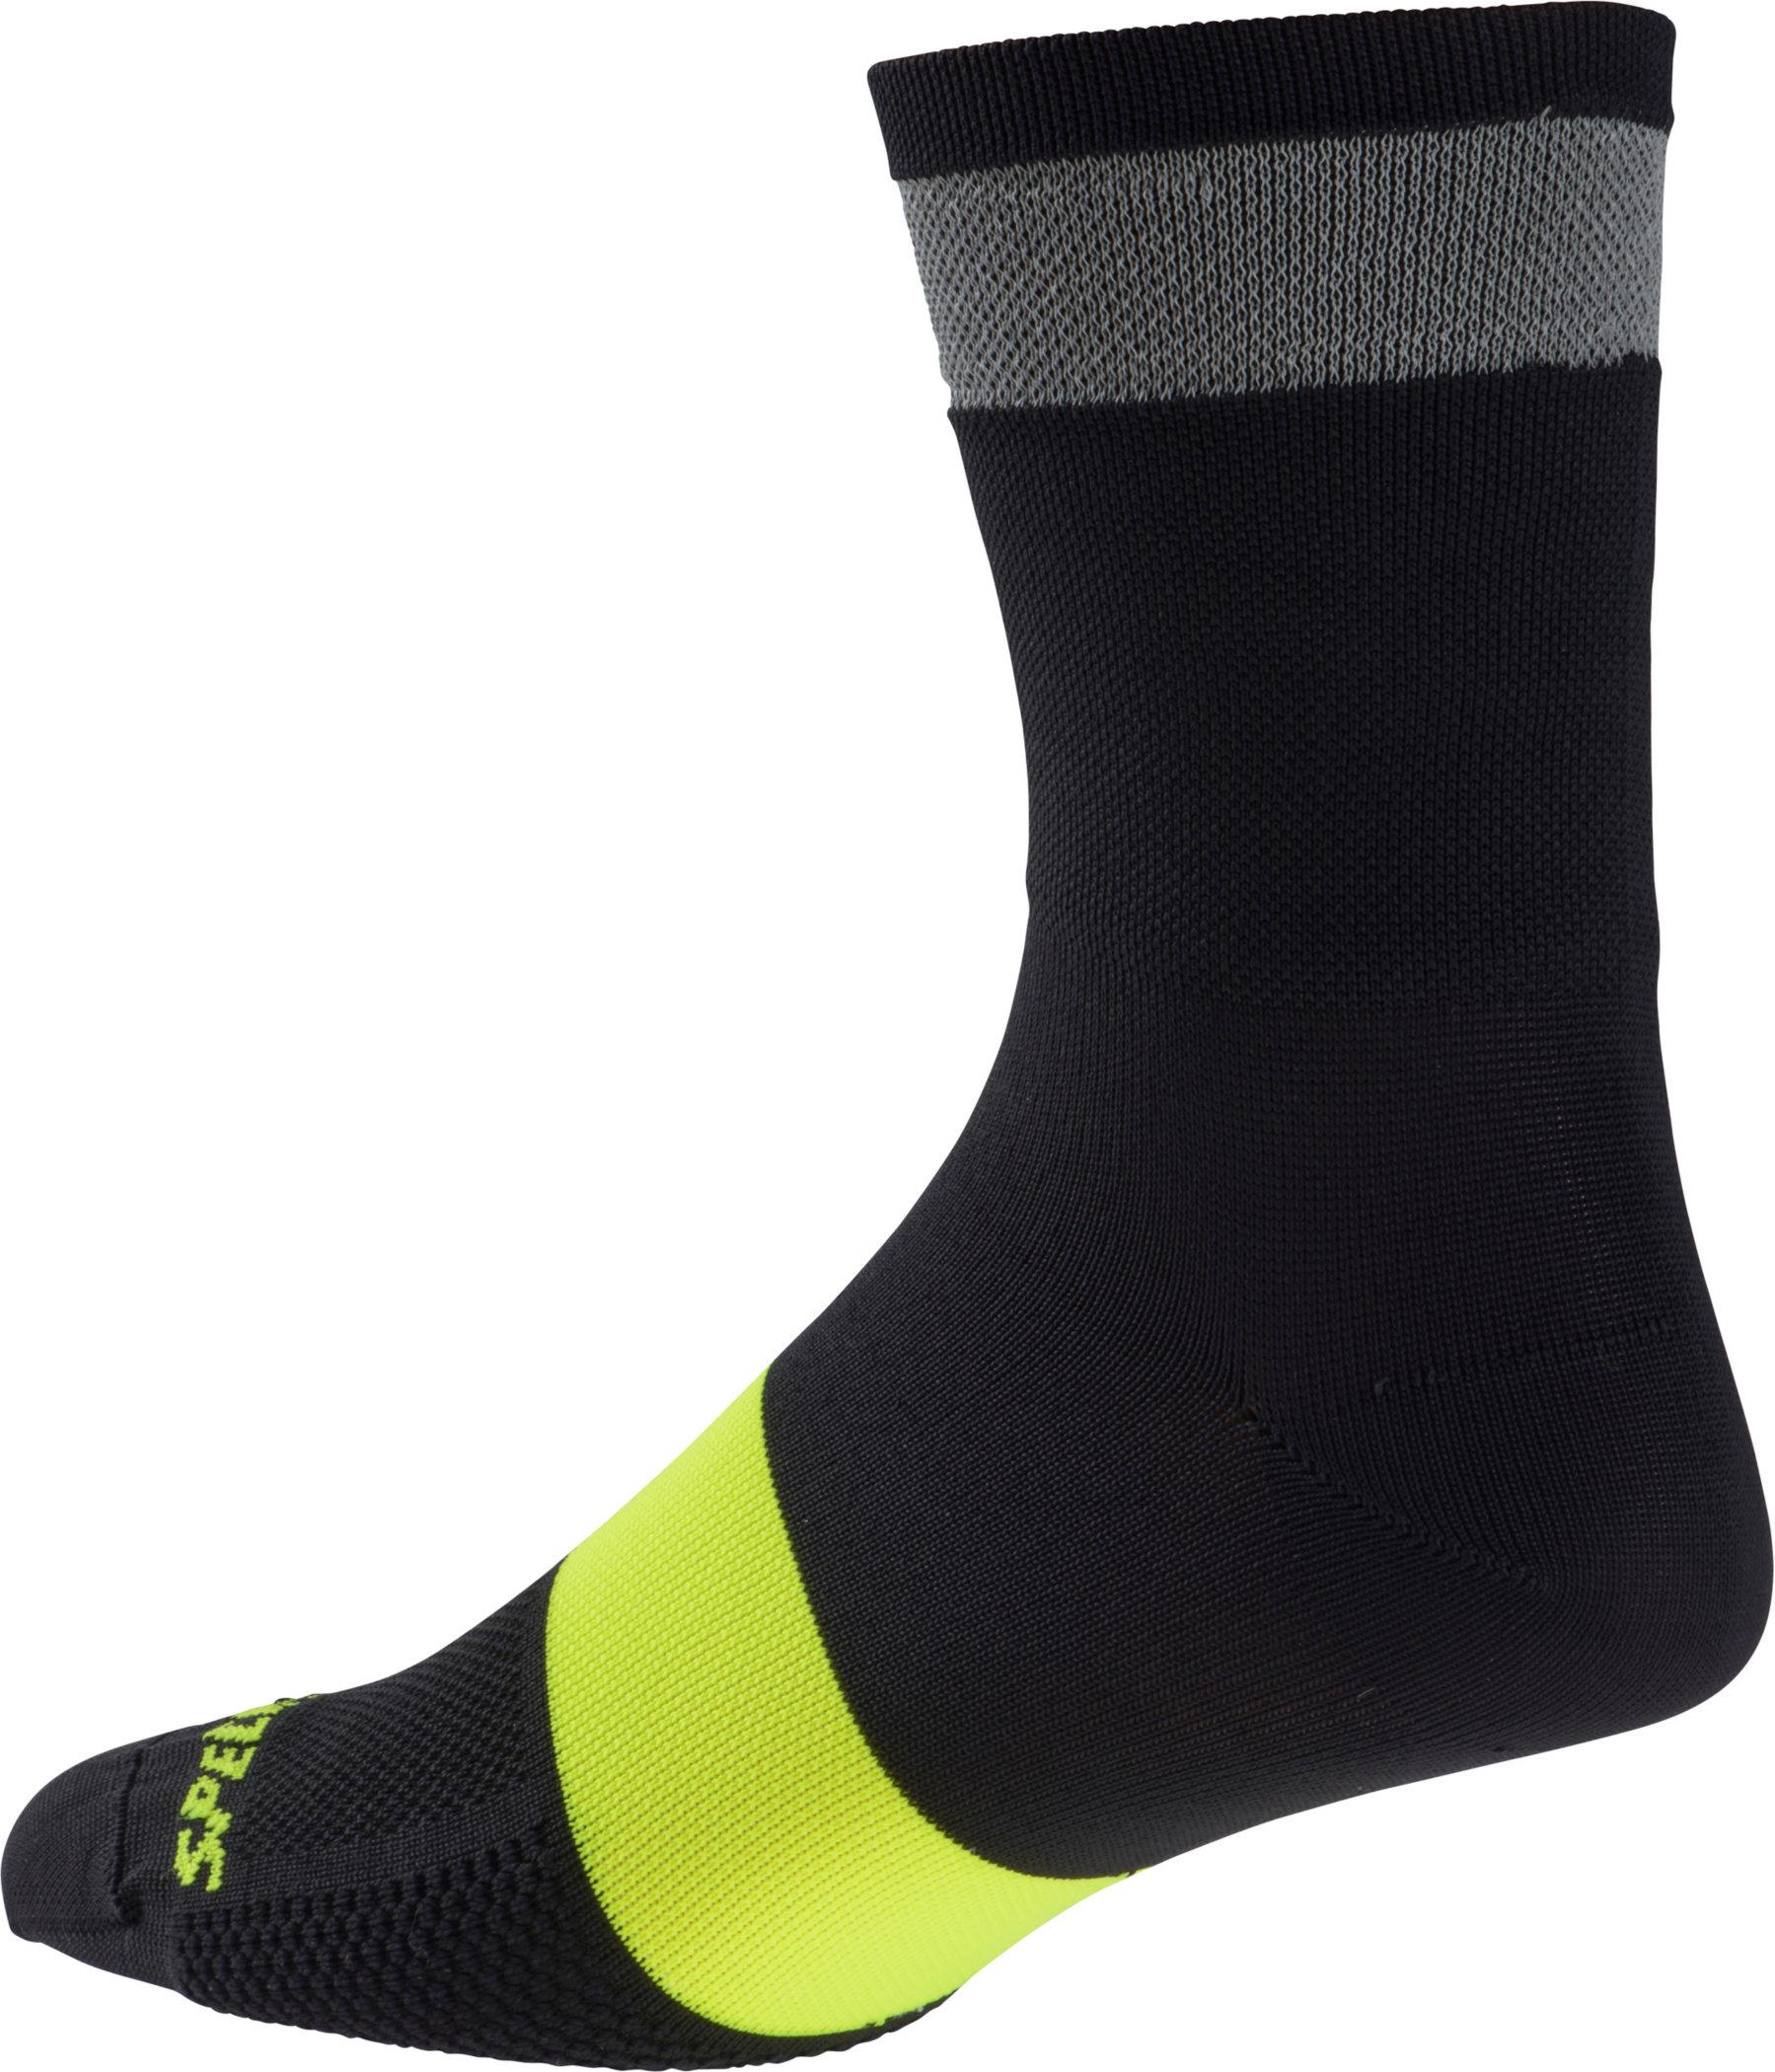 Specialized Reflect Tall Socks Black Large/X-Large - Alpha Bikes